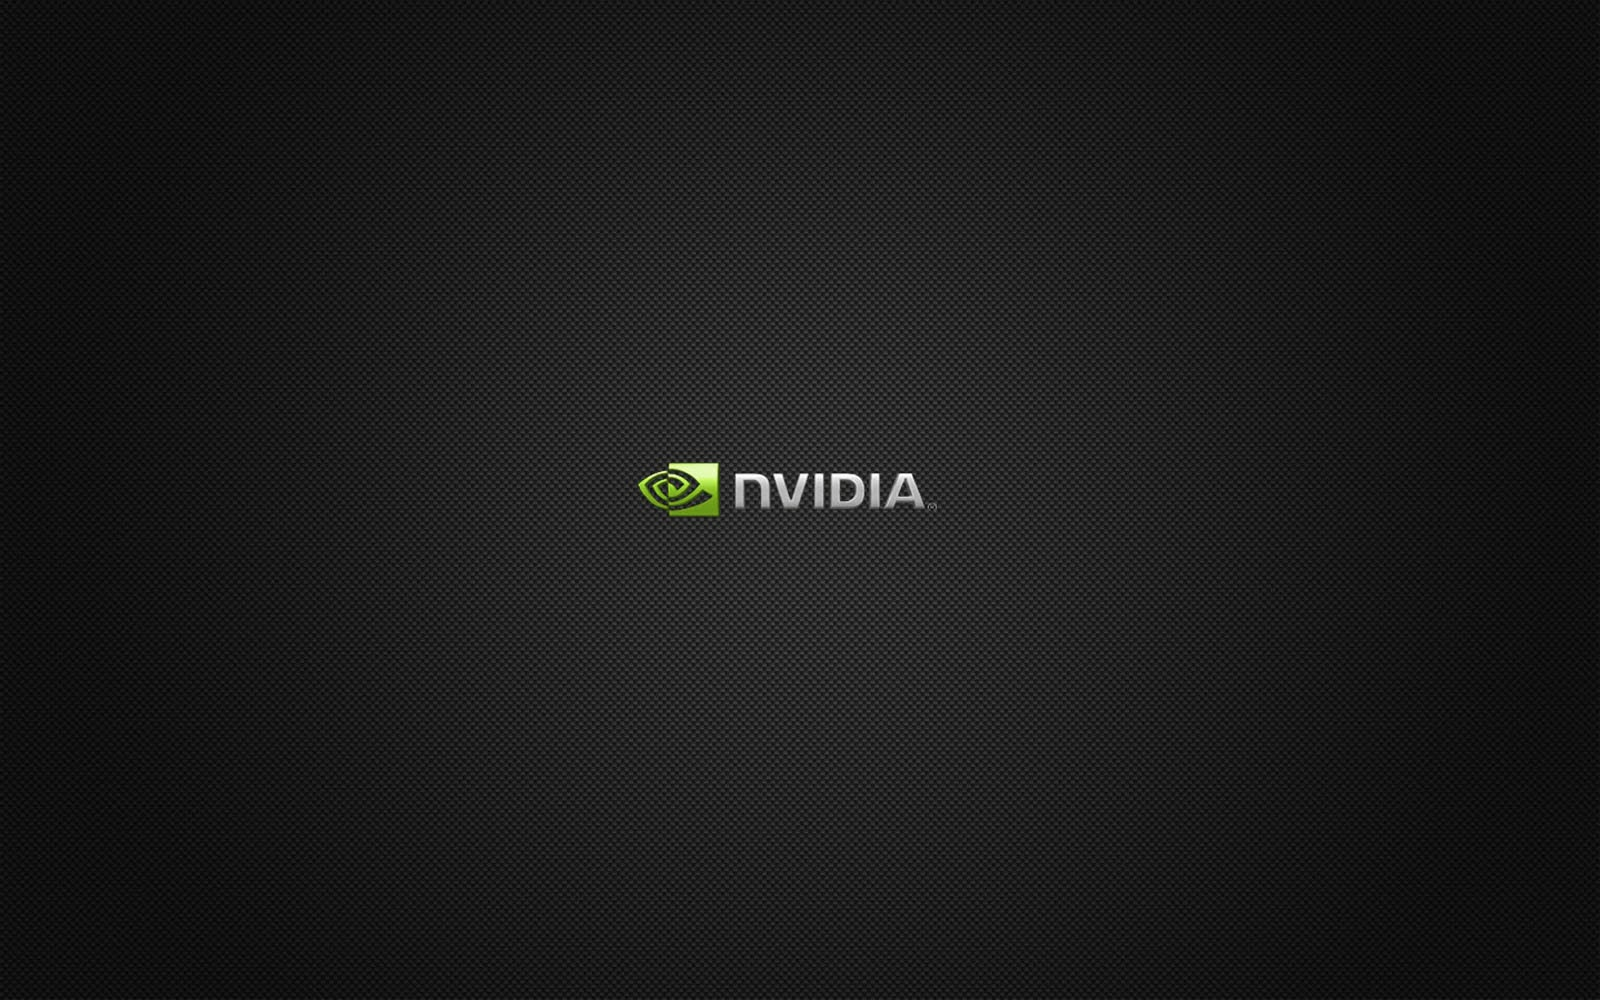 nvidia - photo #44